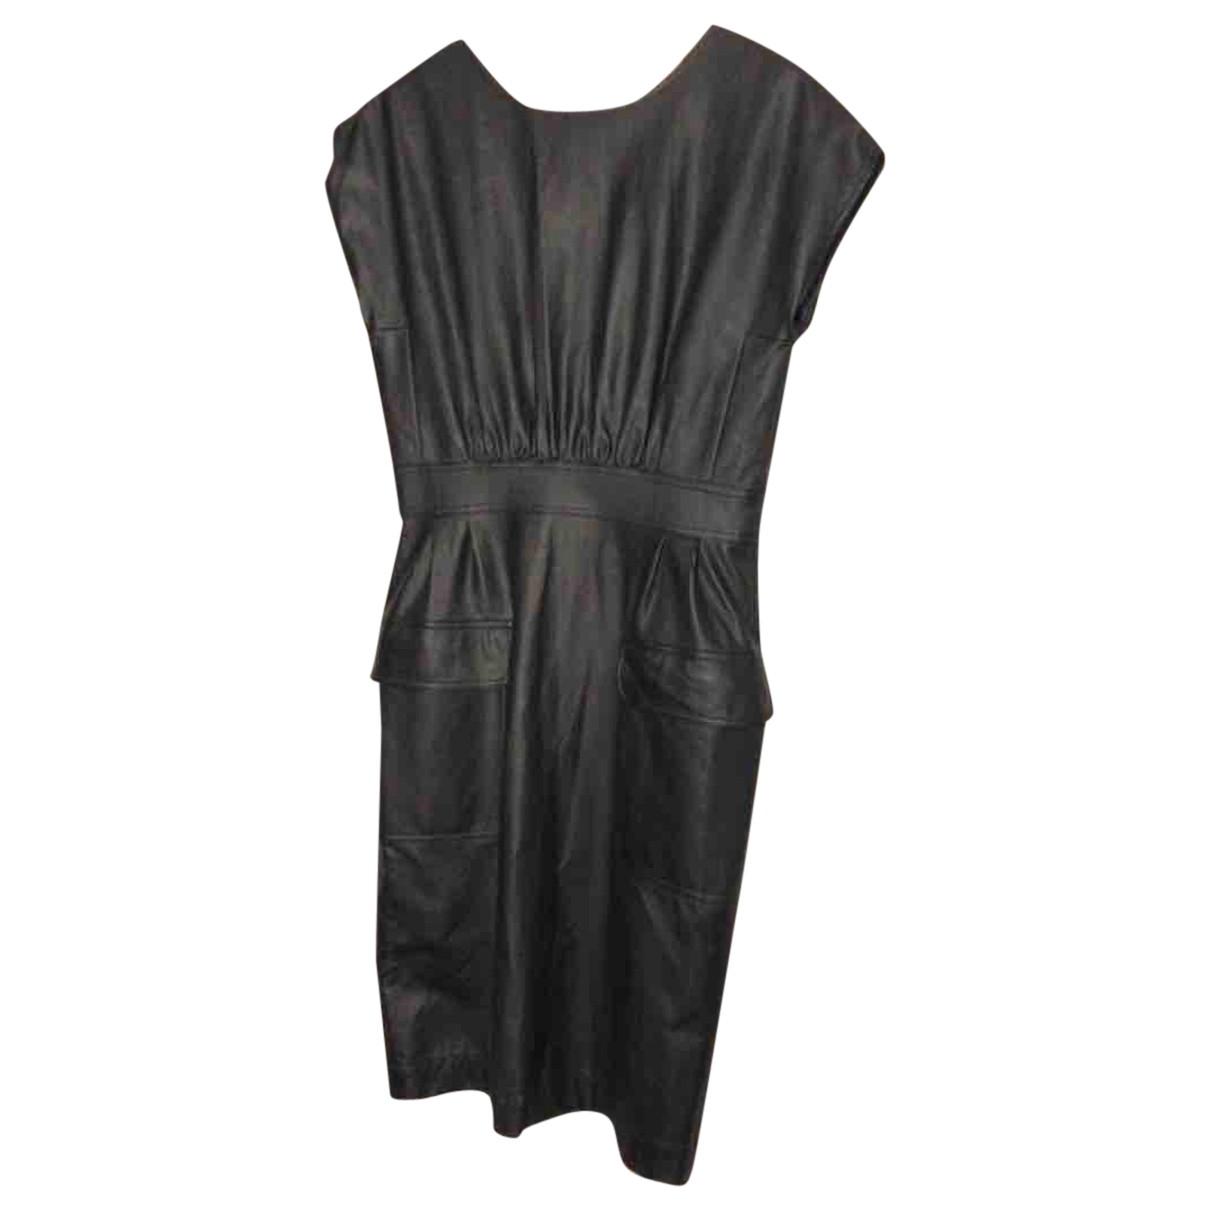 Karl Lagerfeld N Black Leather dress for Women 38 FR